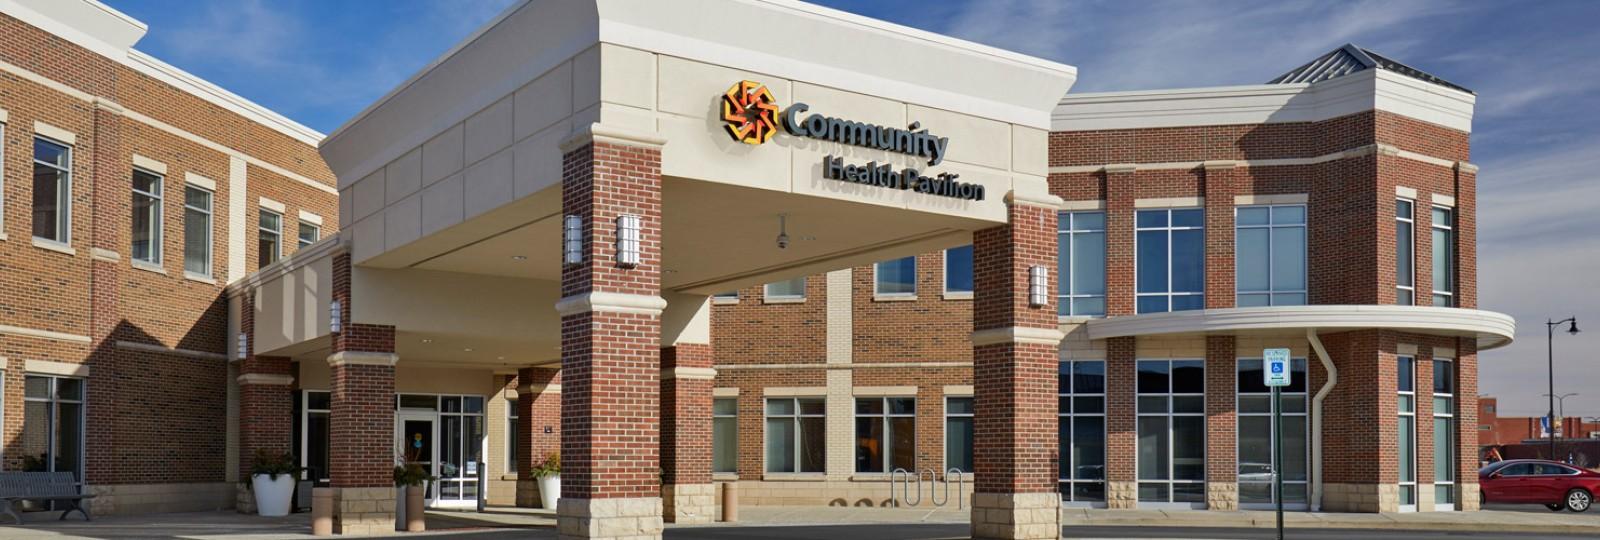 Community Health Pavilion Speedway Community Health Network